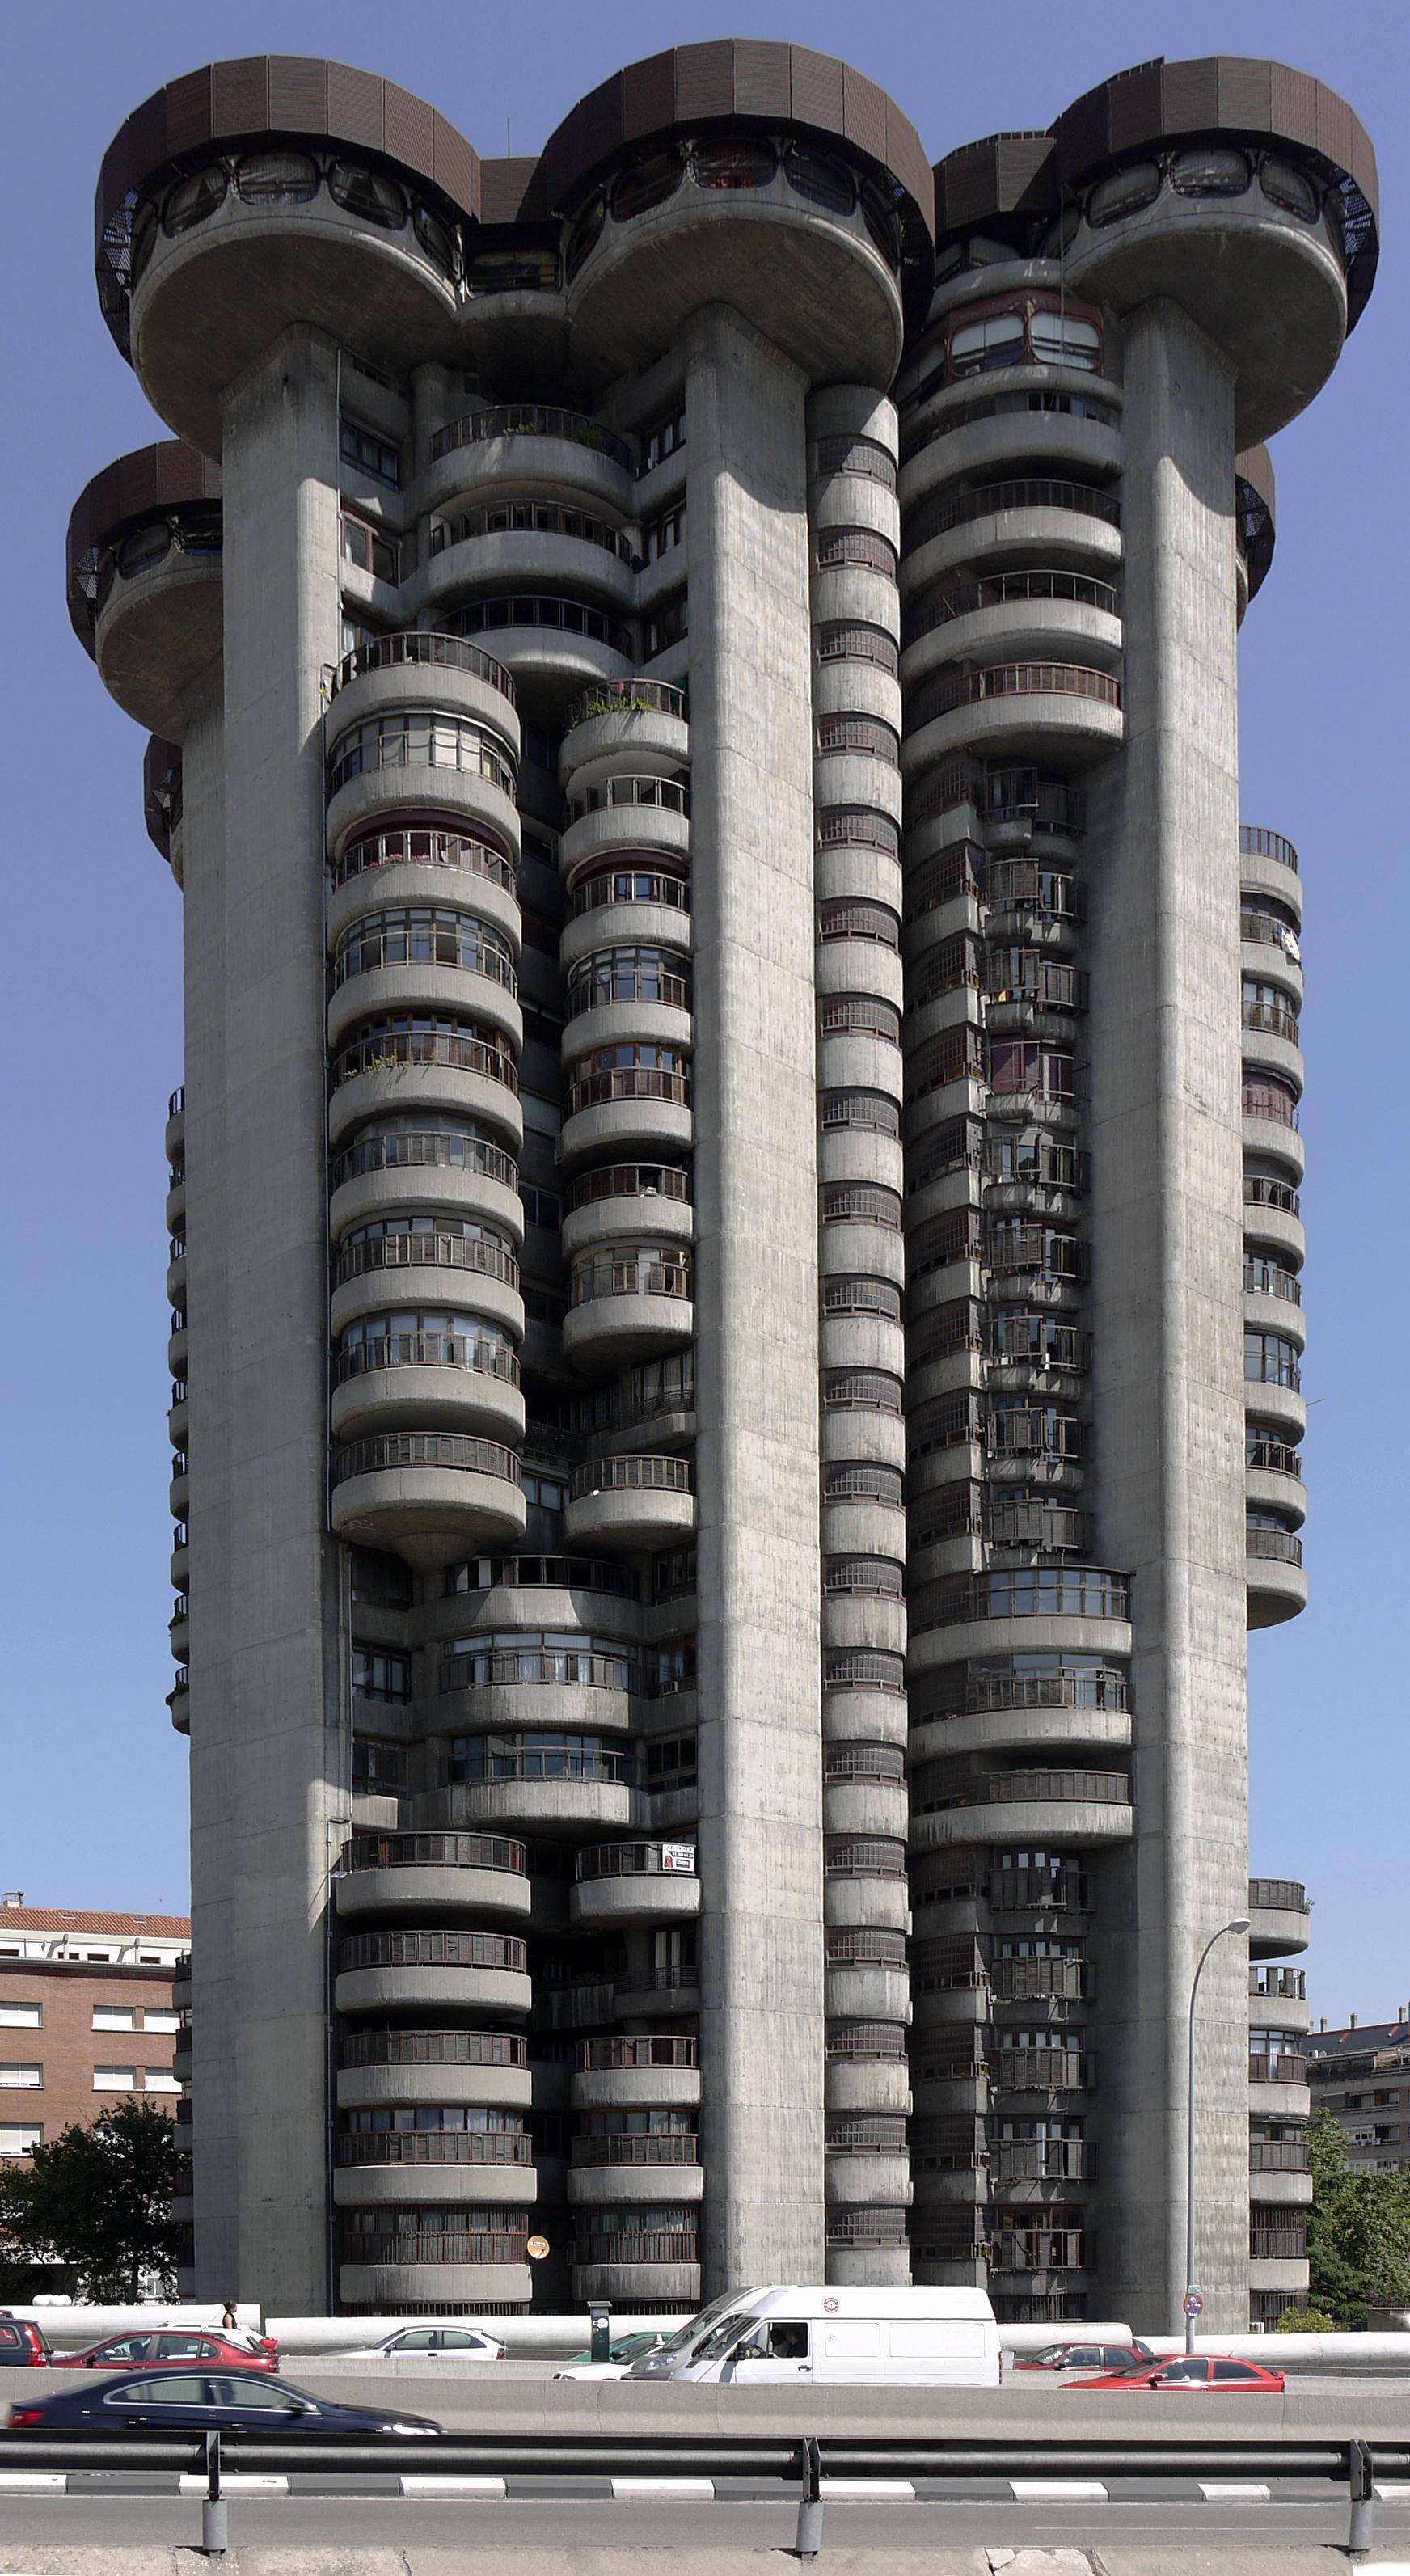 Madrid_Torres_Blancas_close_view